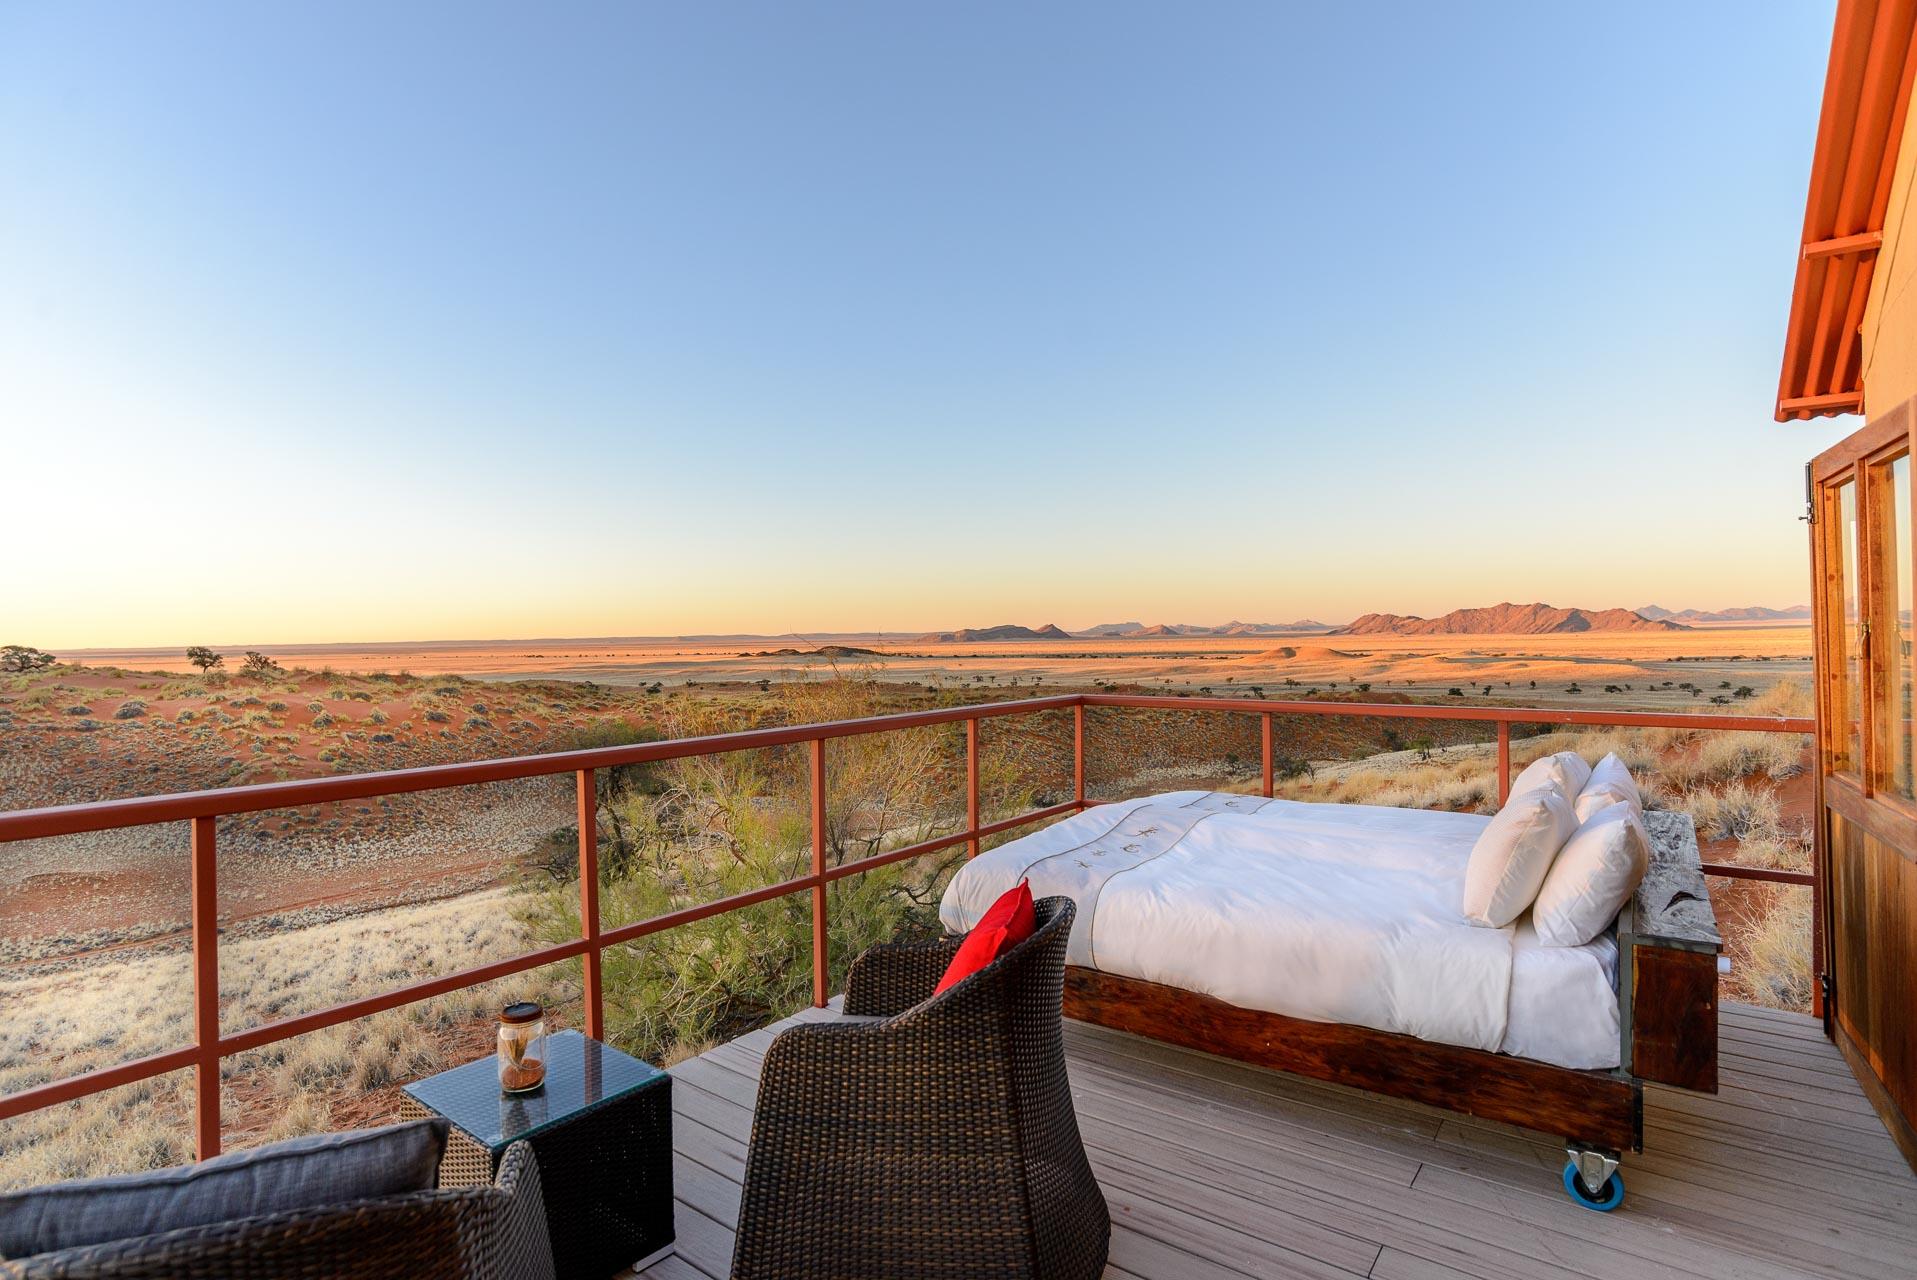 Namib-Dune-Star-Camp-16